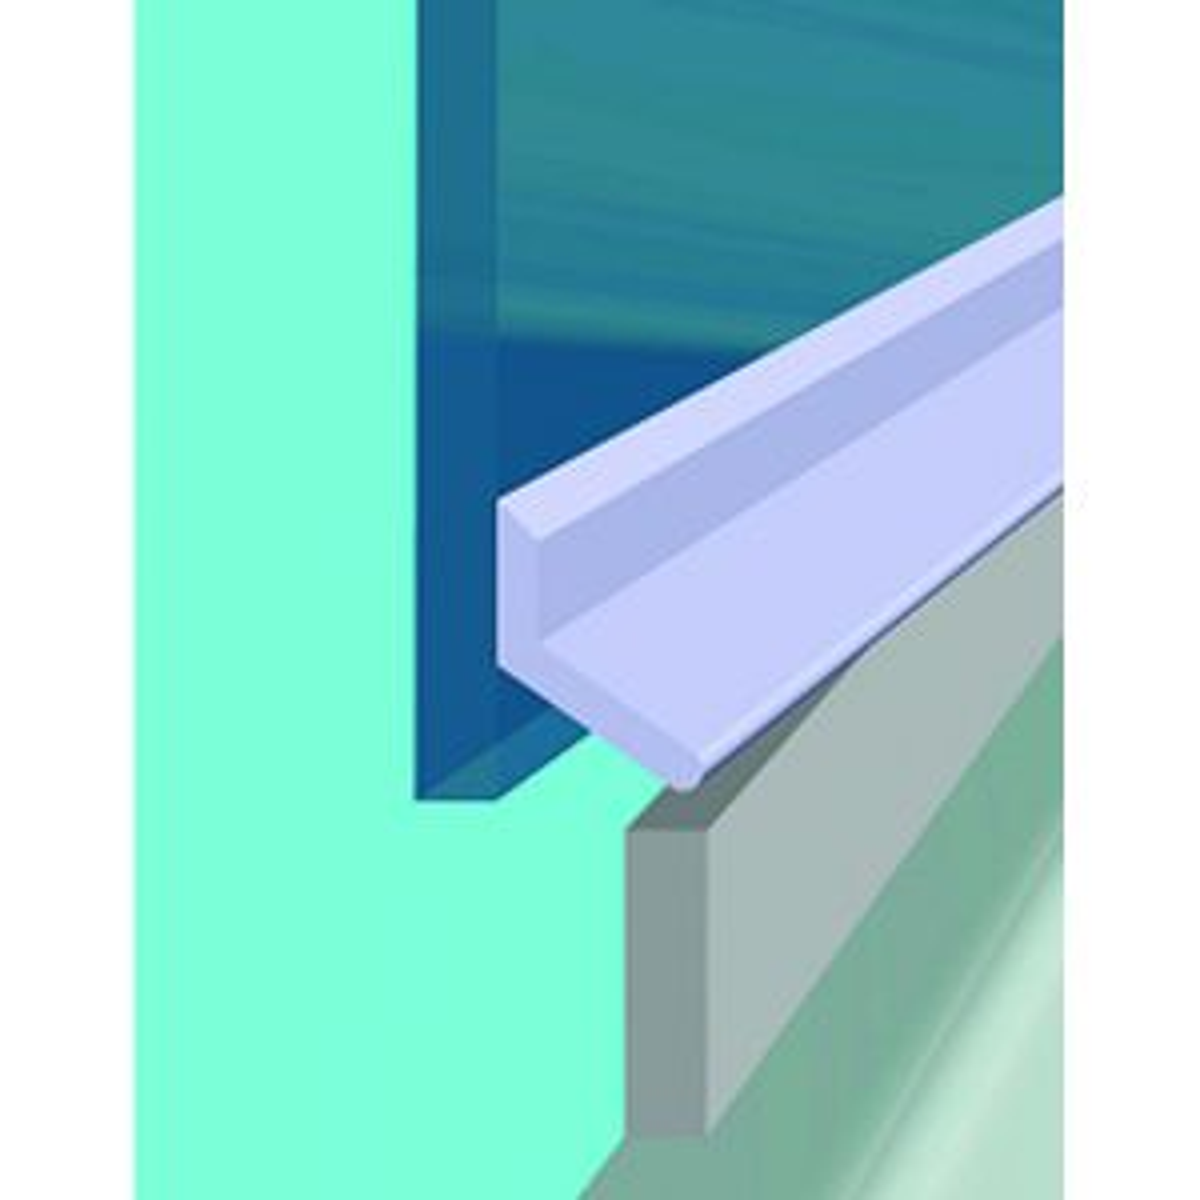 Croydex Universal Shower Door Seal Kit Drawing